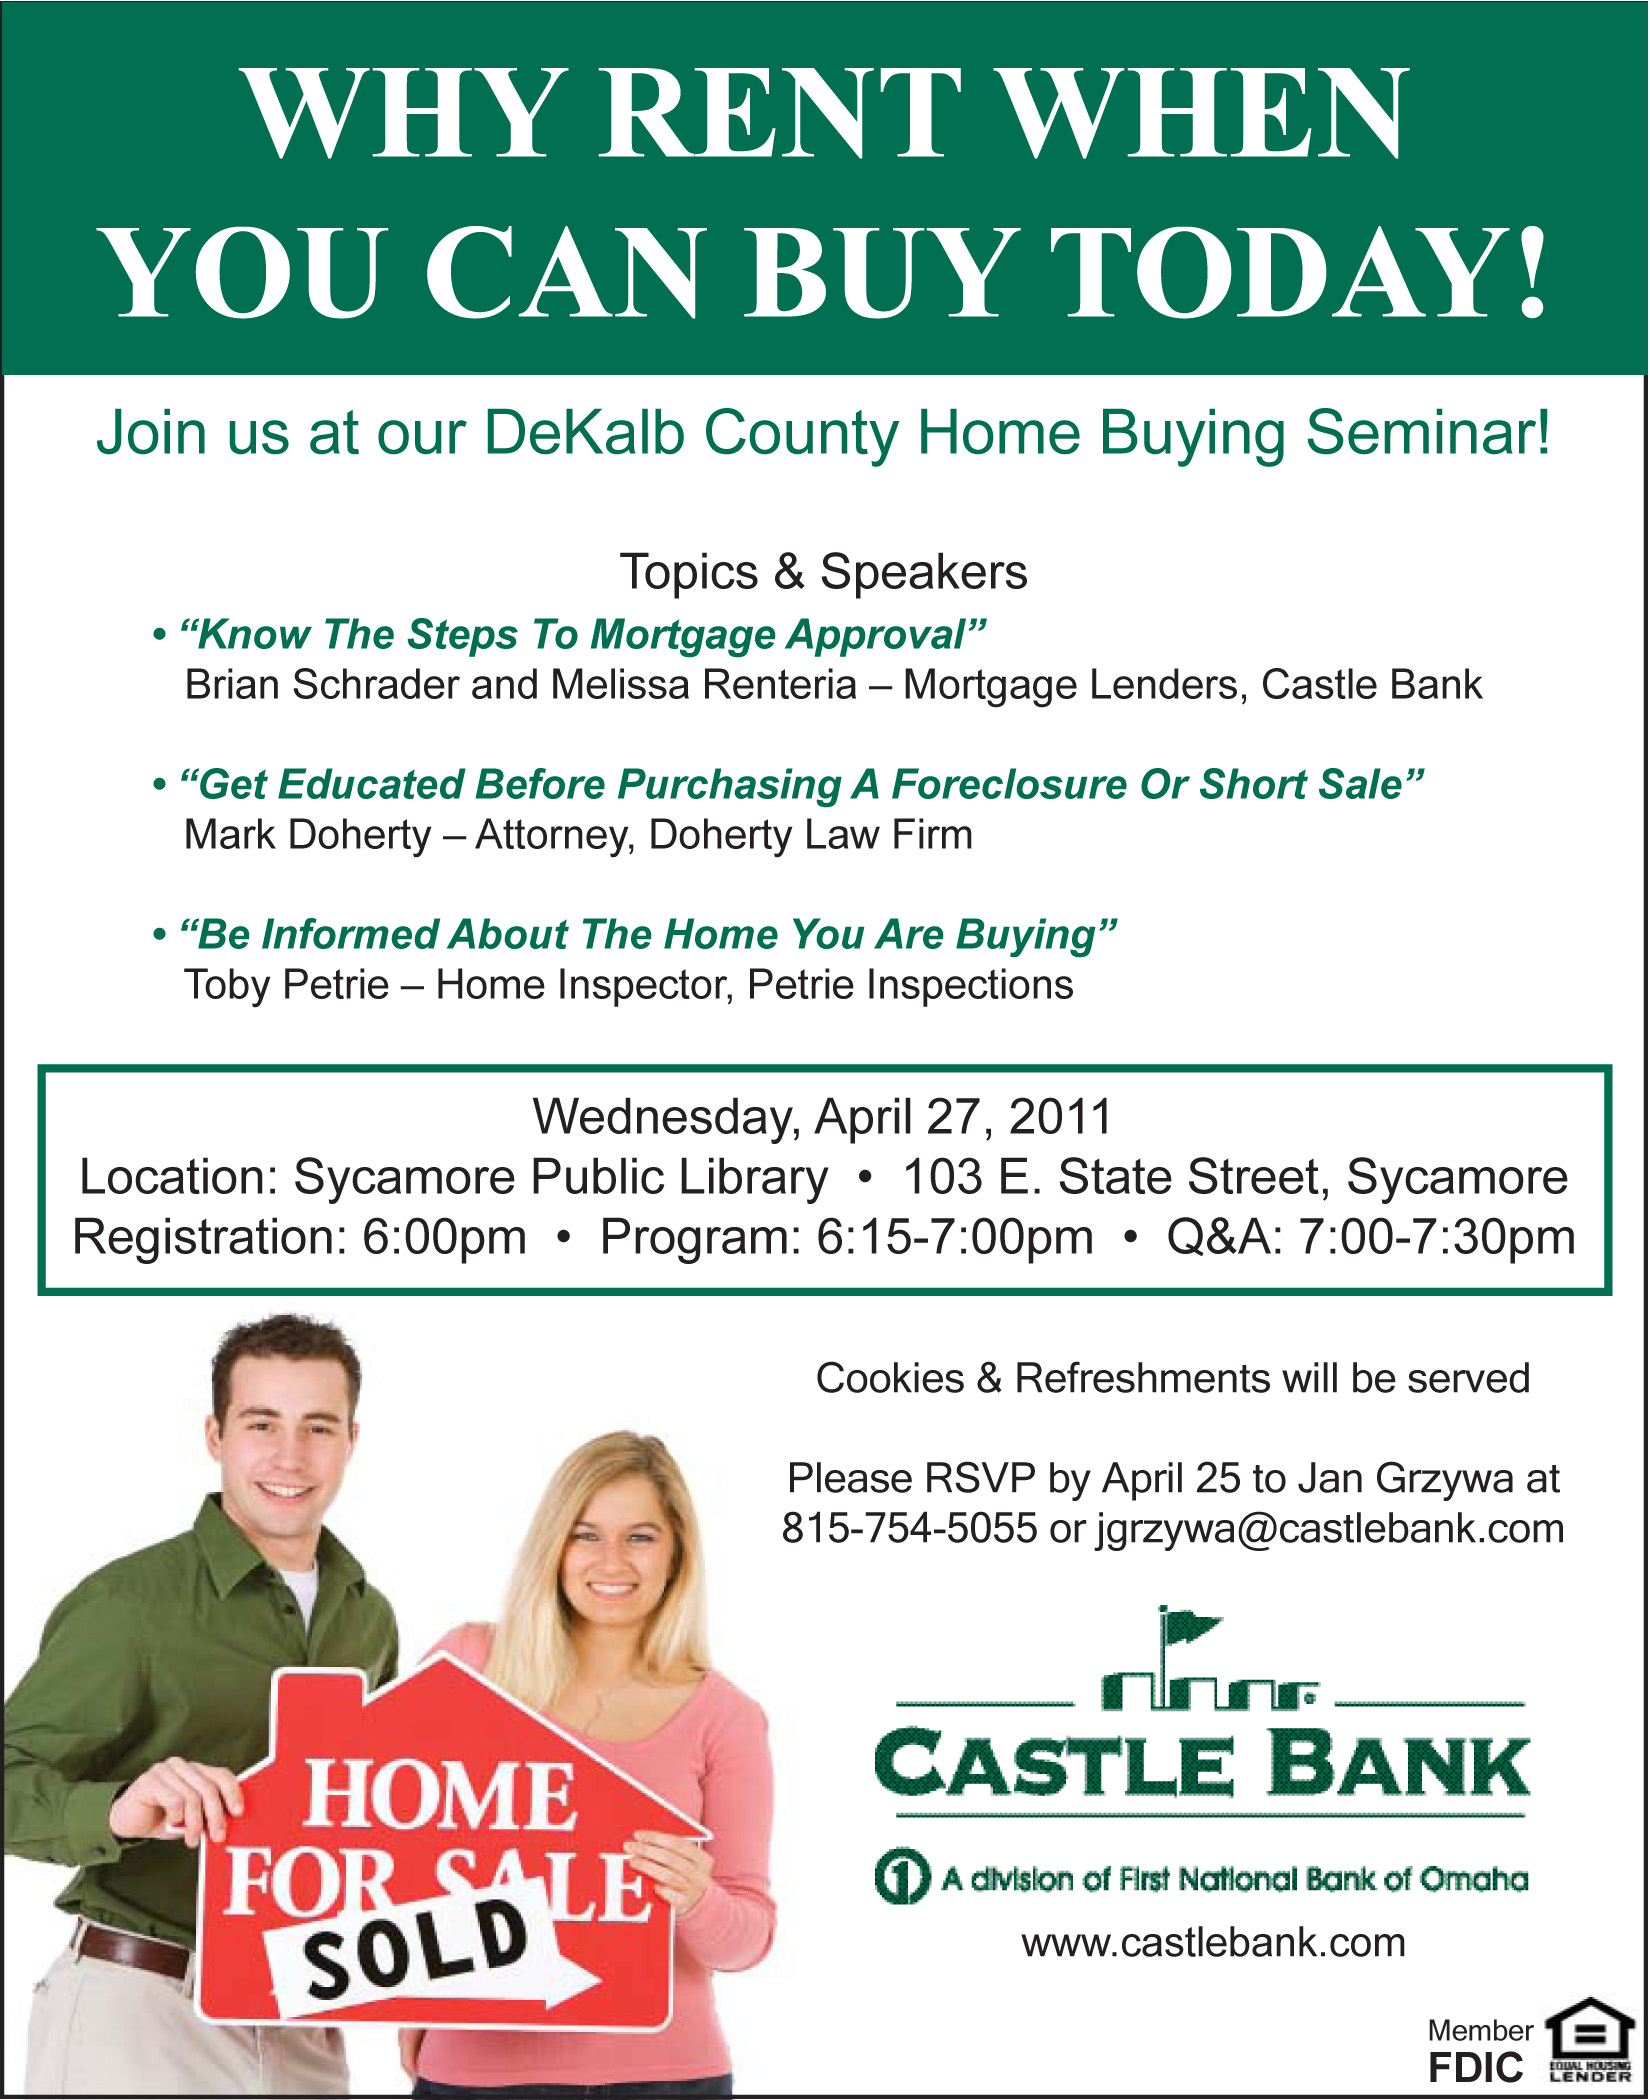 dekalb county home buying seminar wednesday april 27th